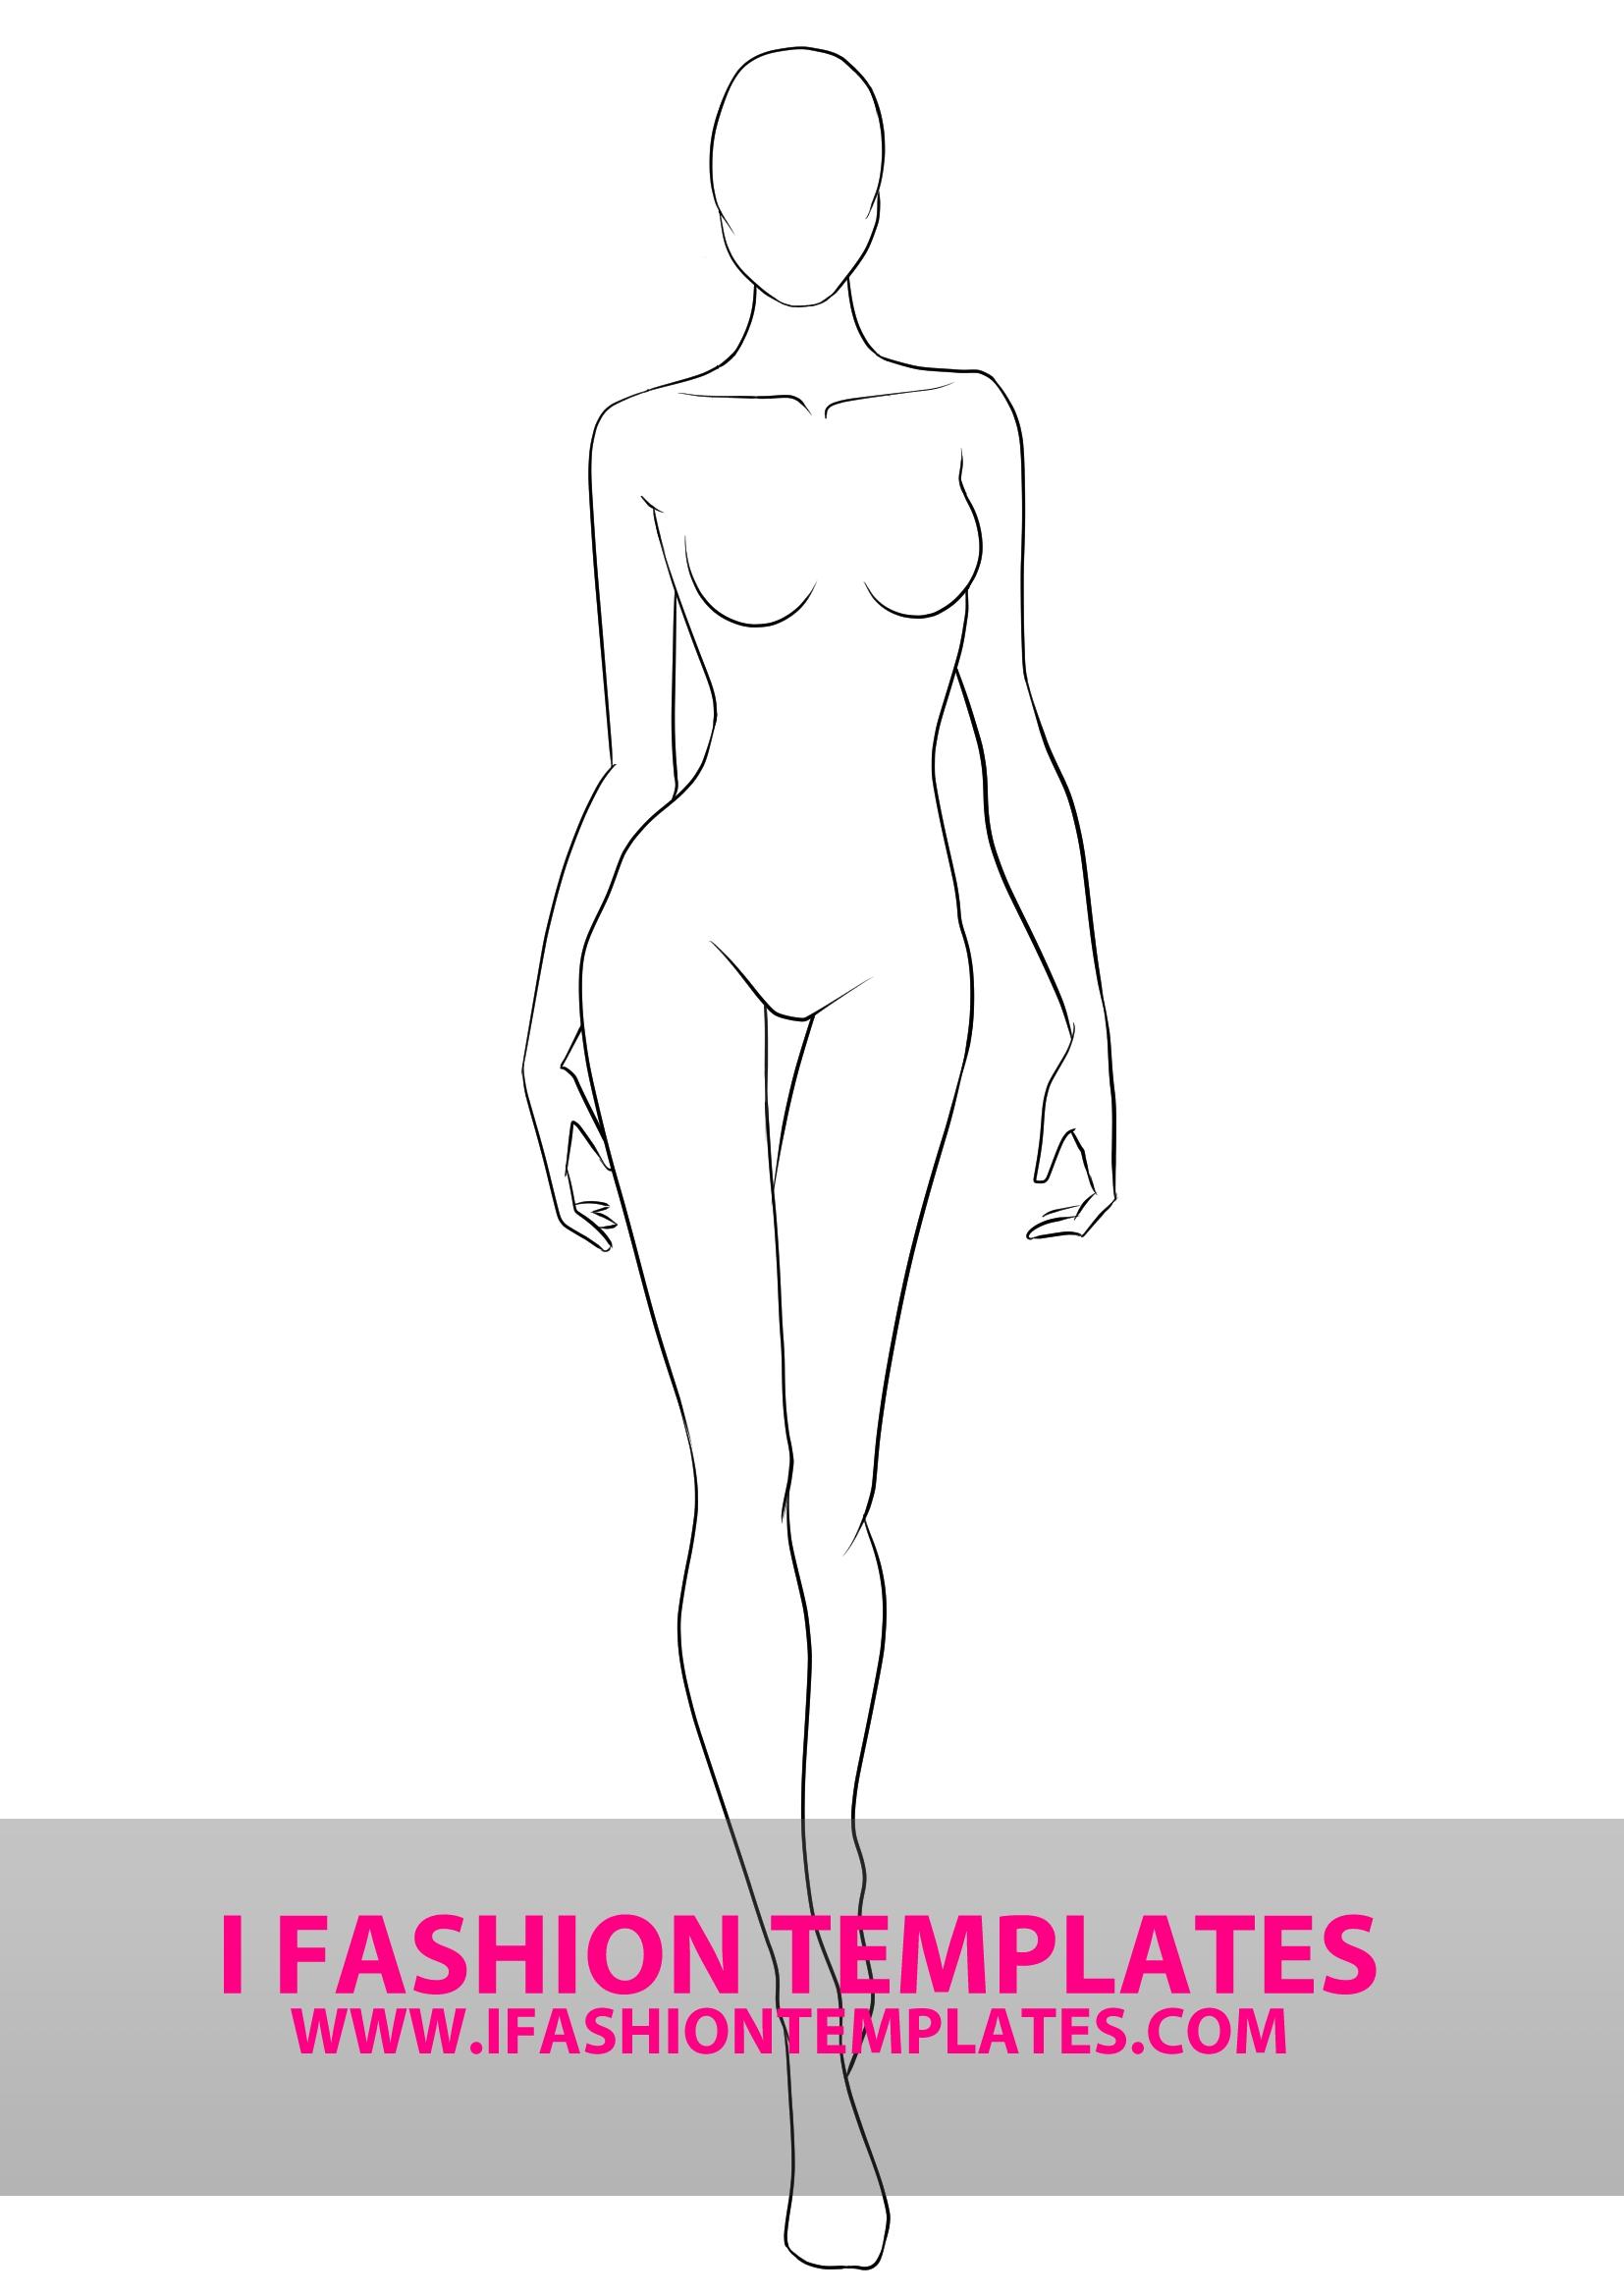 Fashion Model Outline : fashion, model, outline, Fashion, Template, Croquis—, Templates